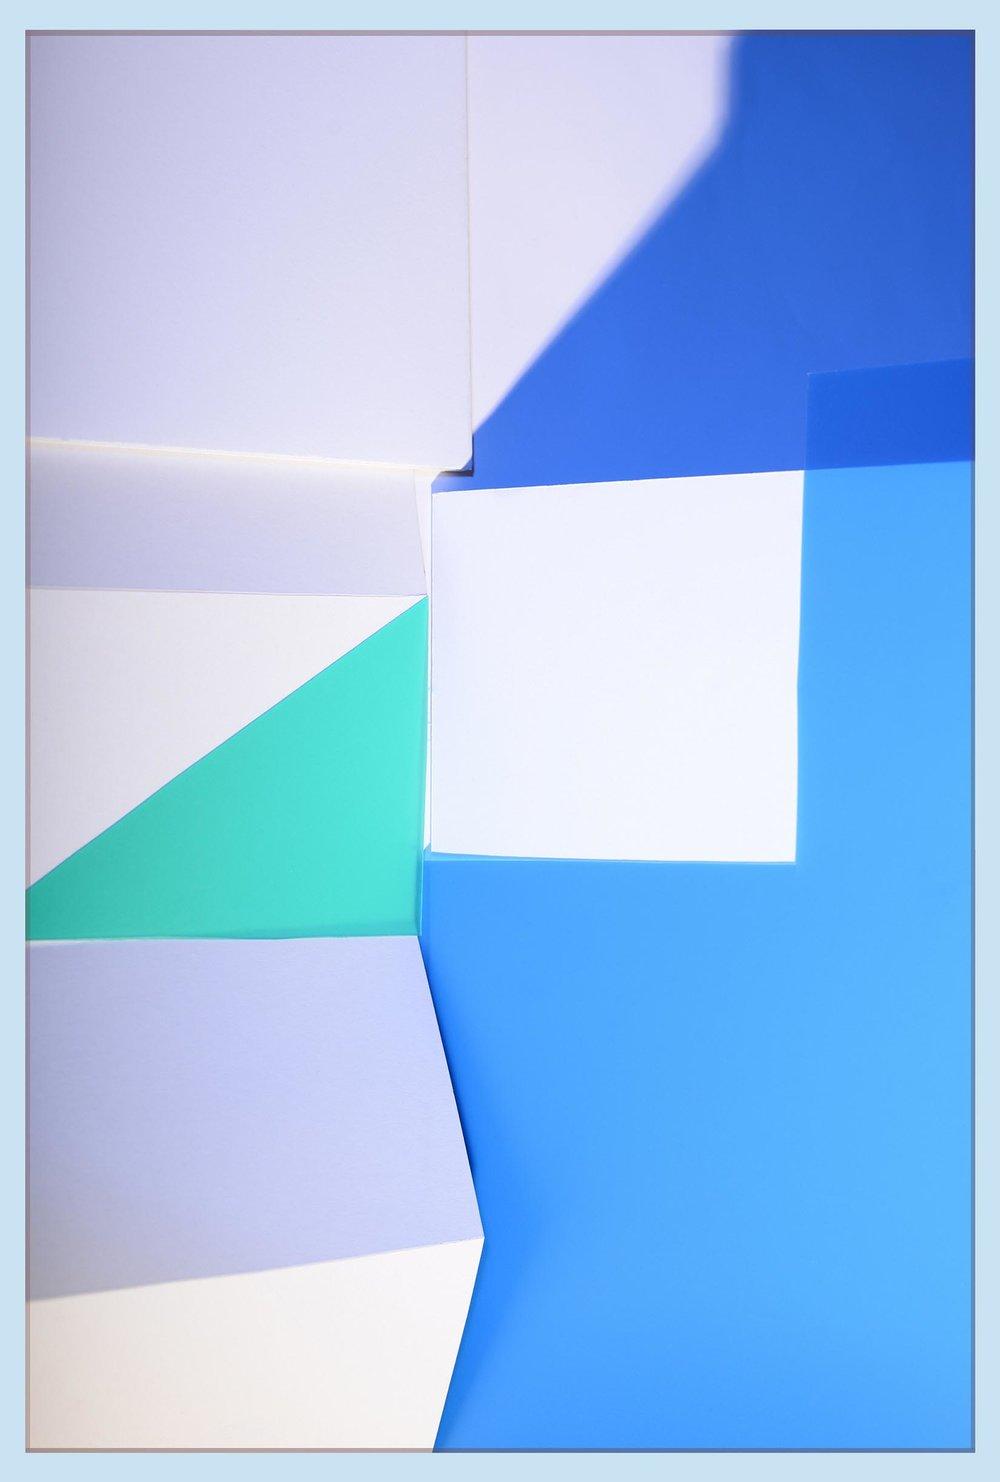 LYDIA WEGNER   Aqua Edge   2017 Archival inkjet print 90 x 60 cm